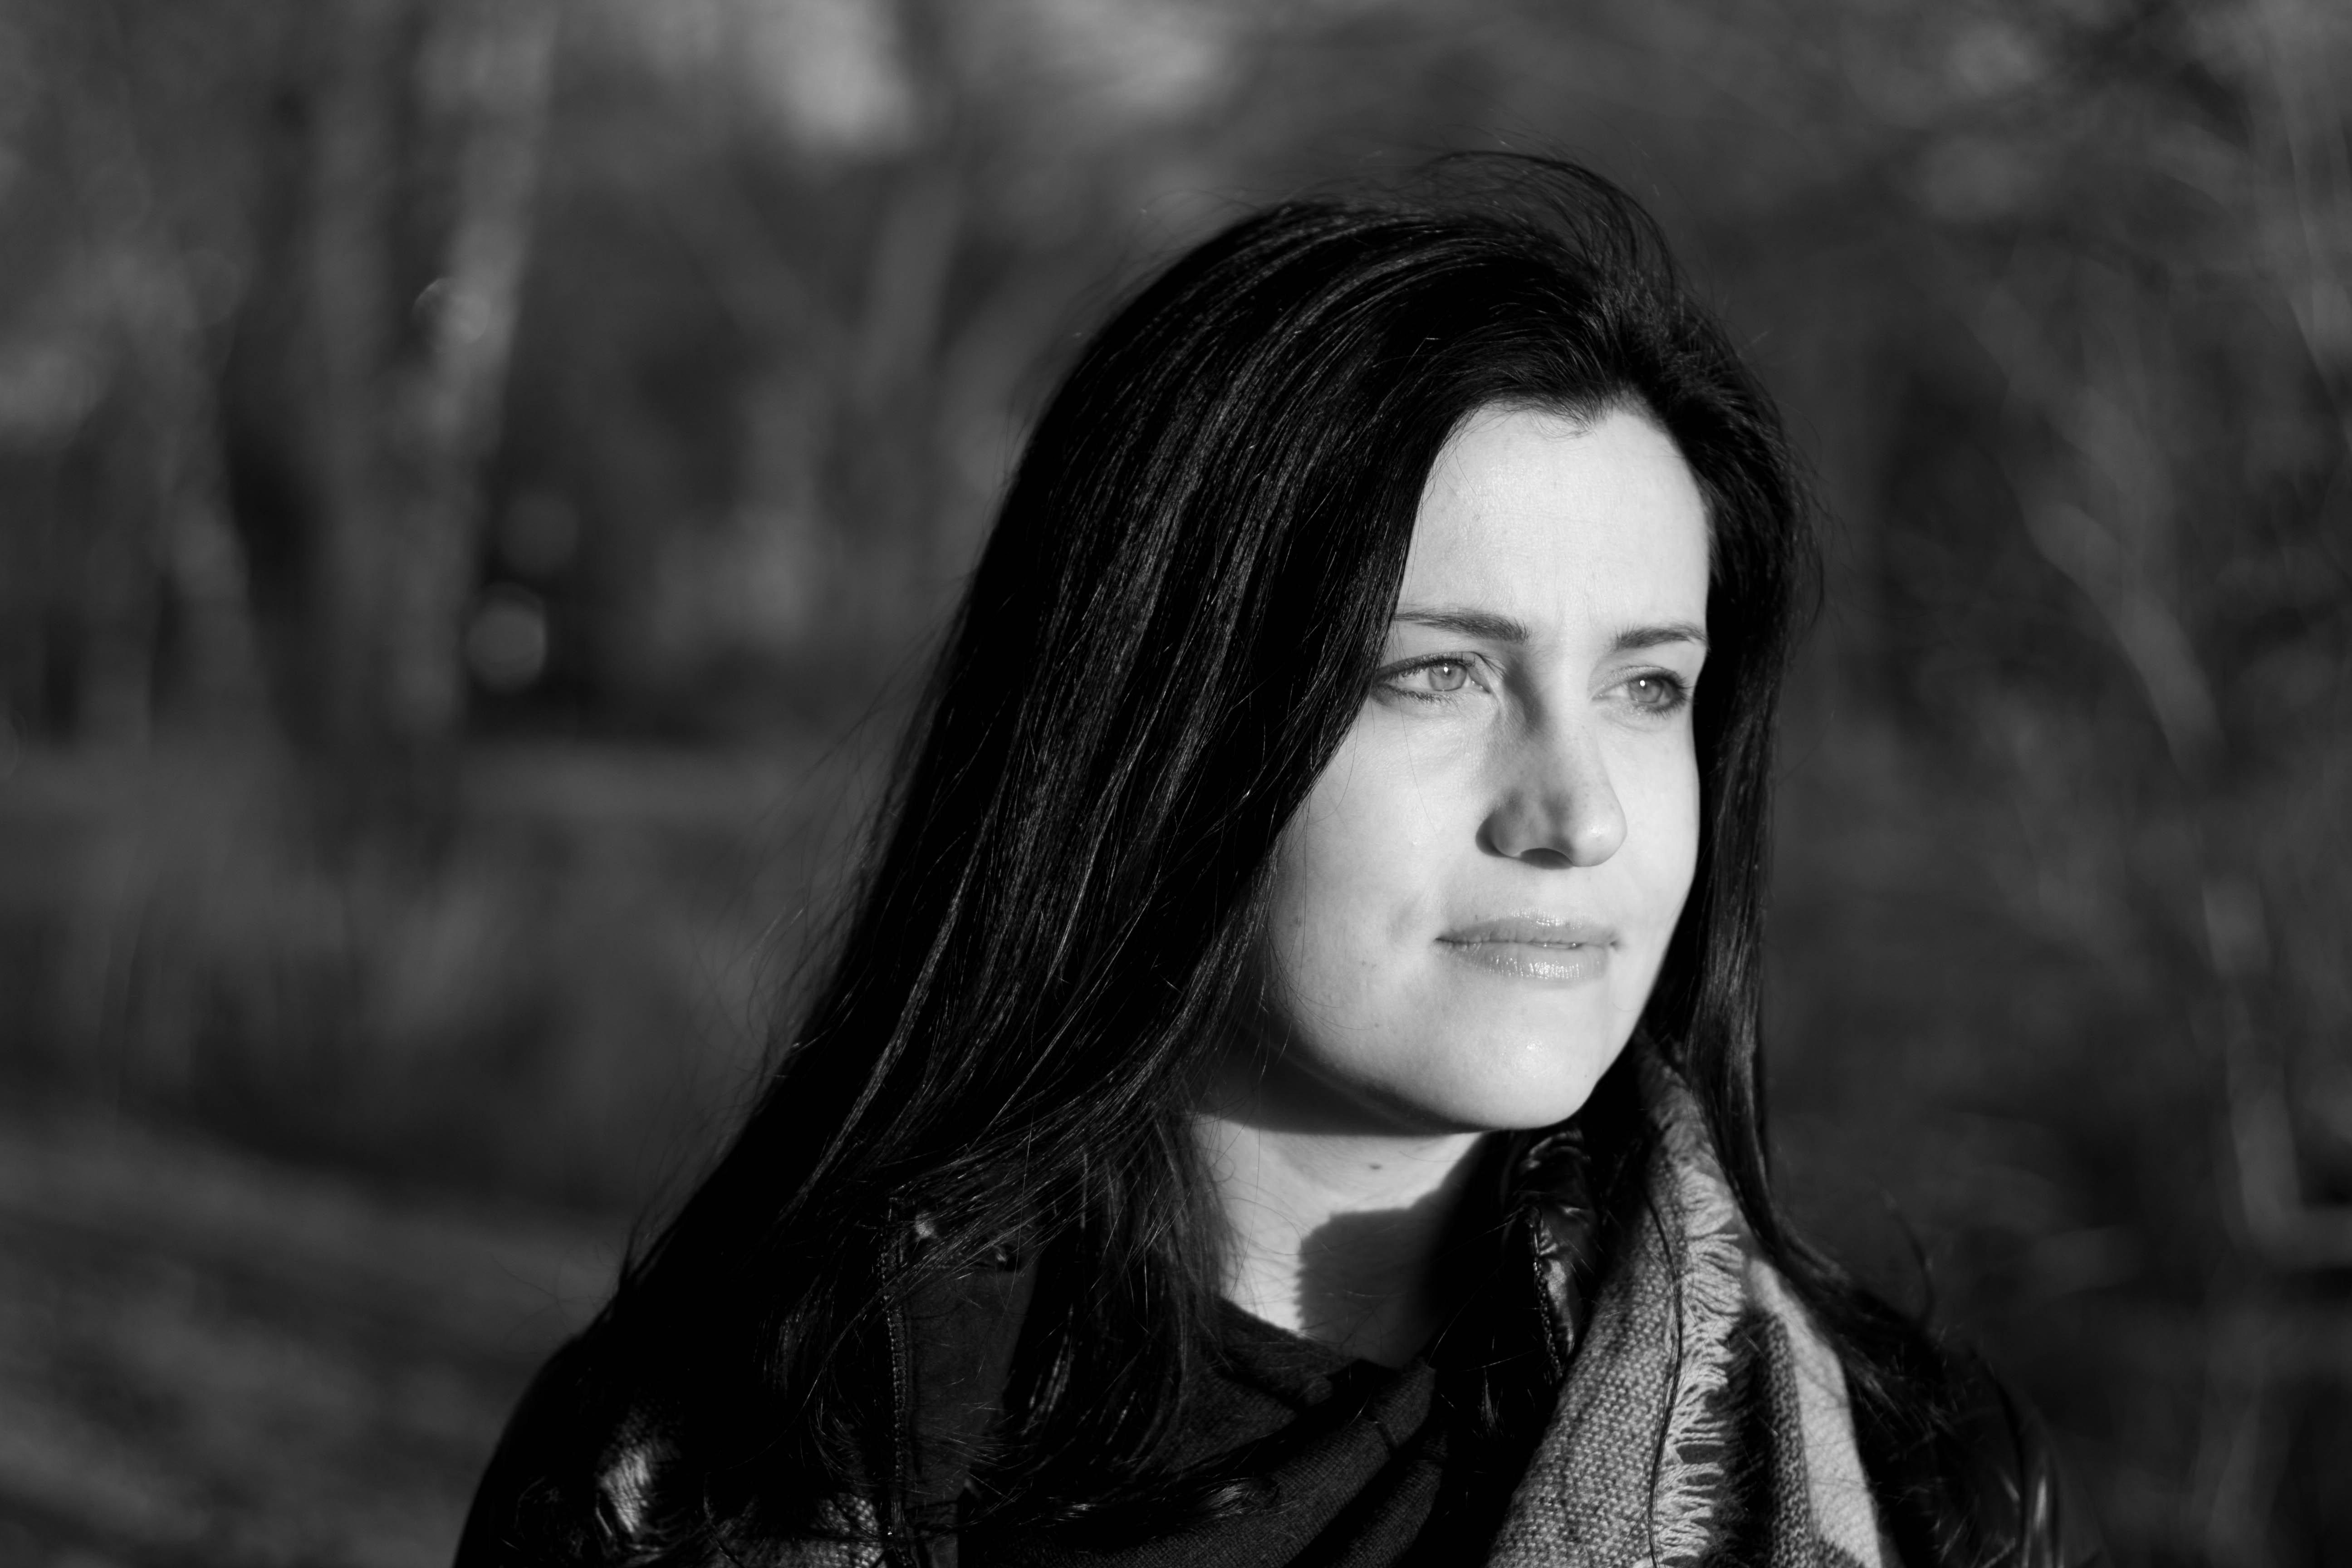 Grayscale Photo of Woman Wearing Scarf, Black-and-white, Dark hair, Female, Girl, HQ Photo